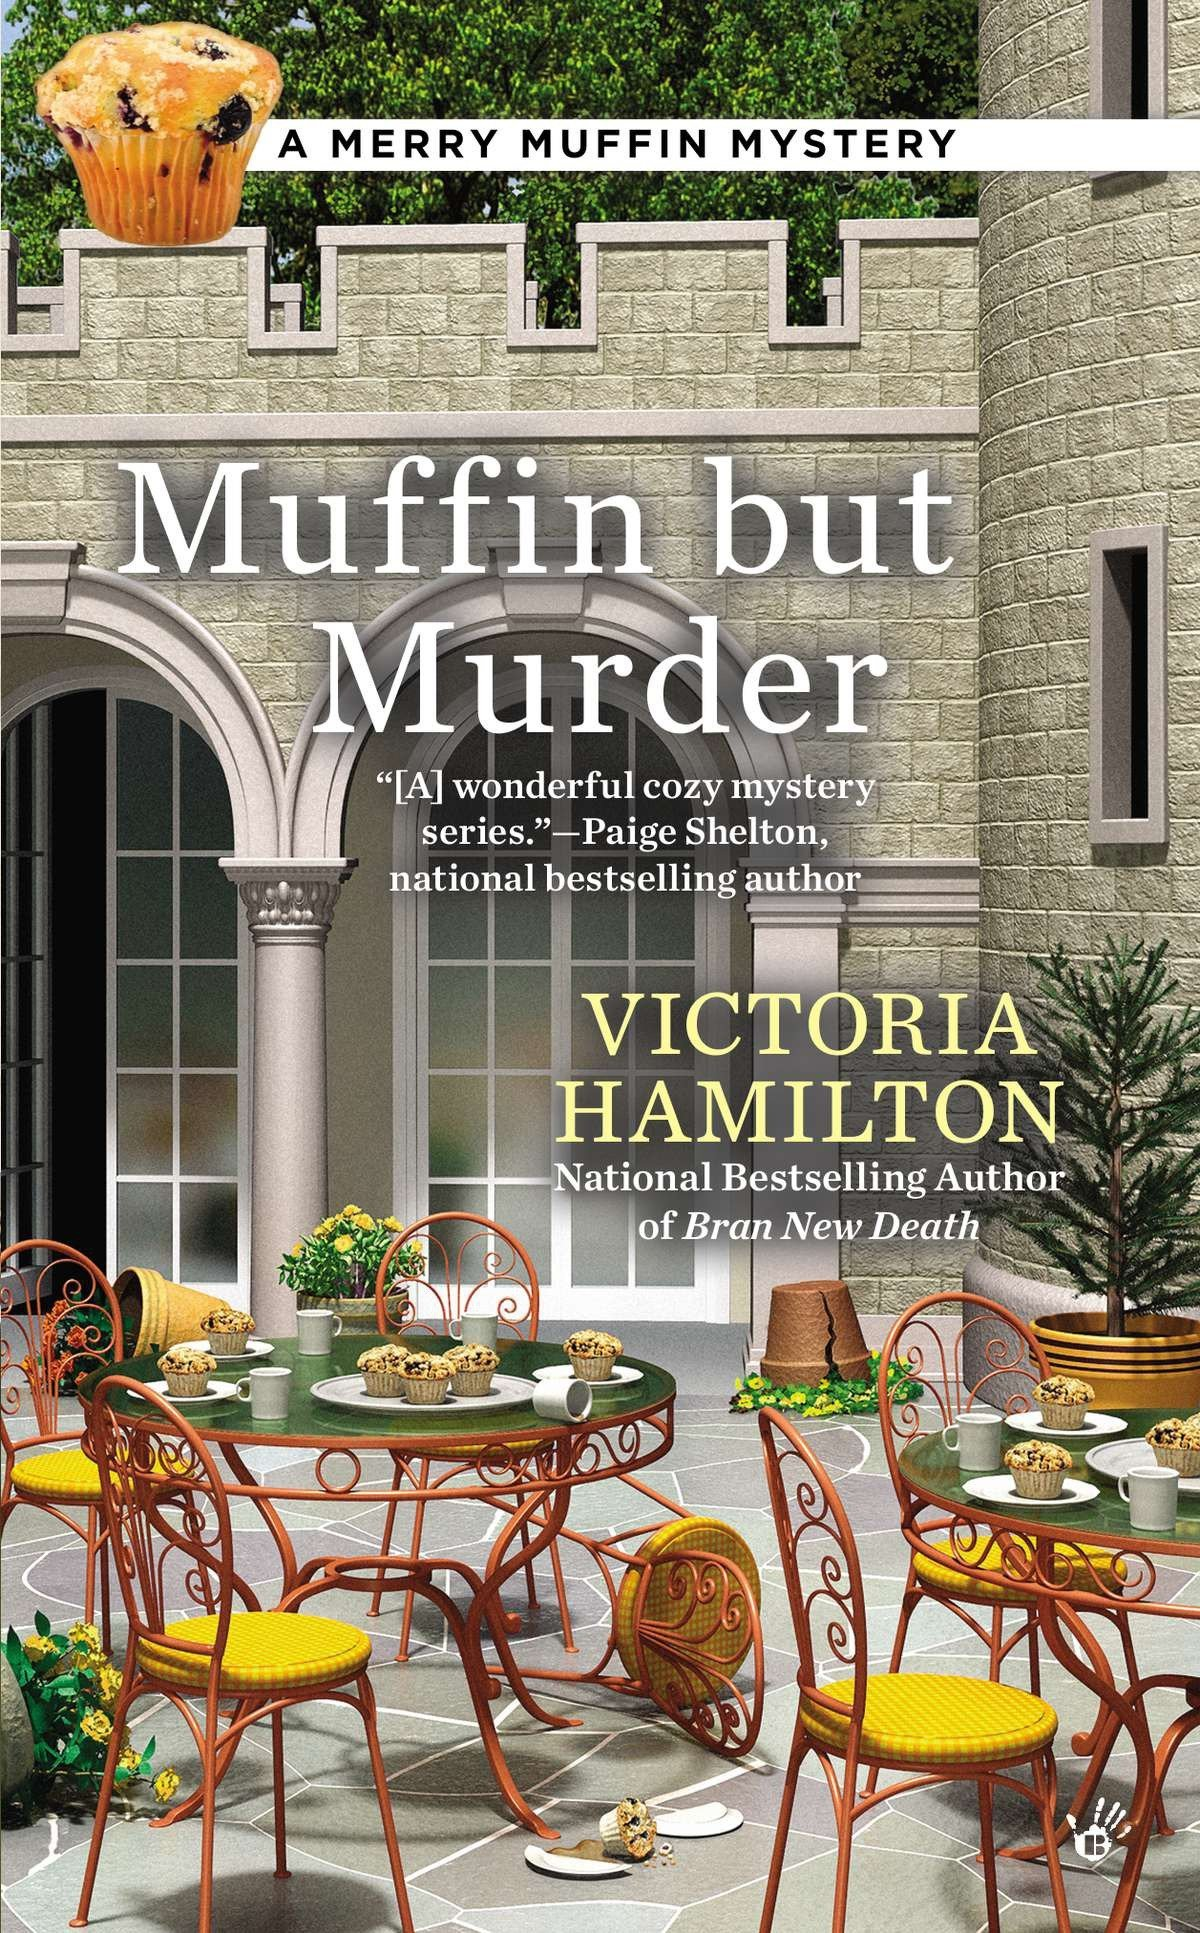 Muffin But Murder (A Merry Muffin Mystery) ebook